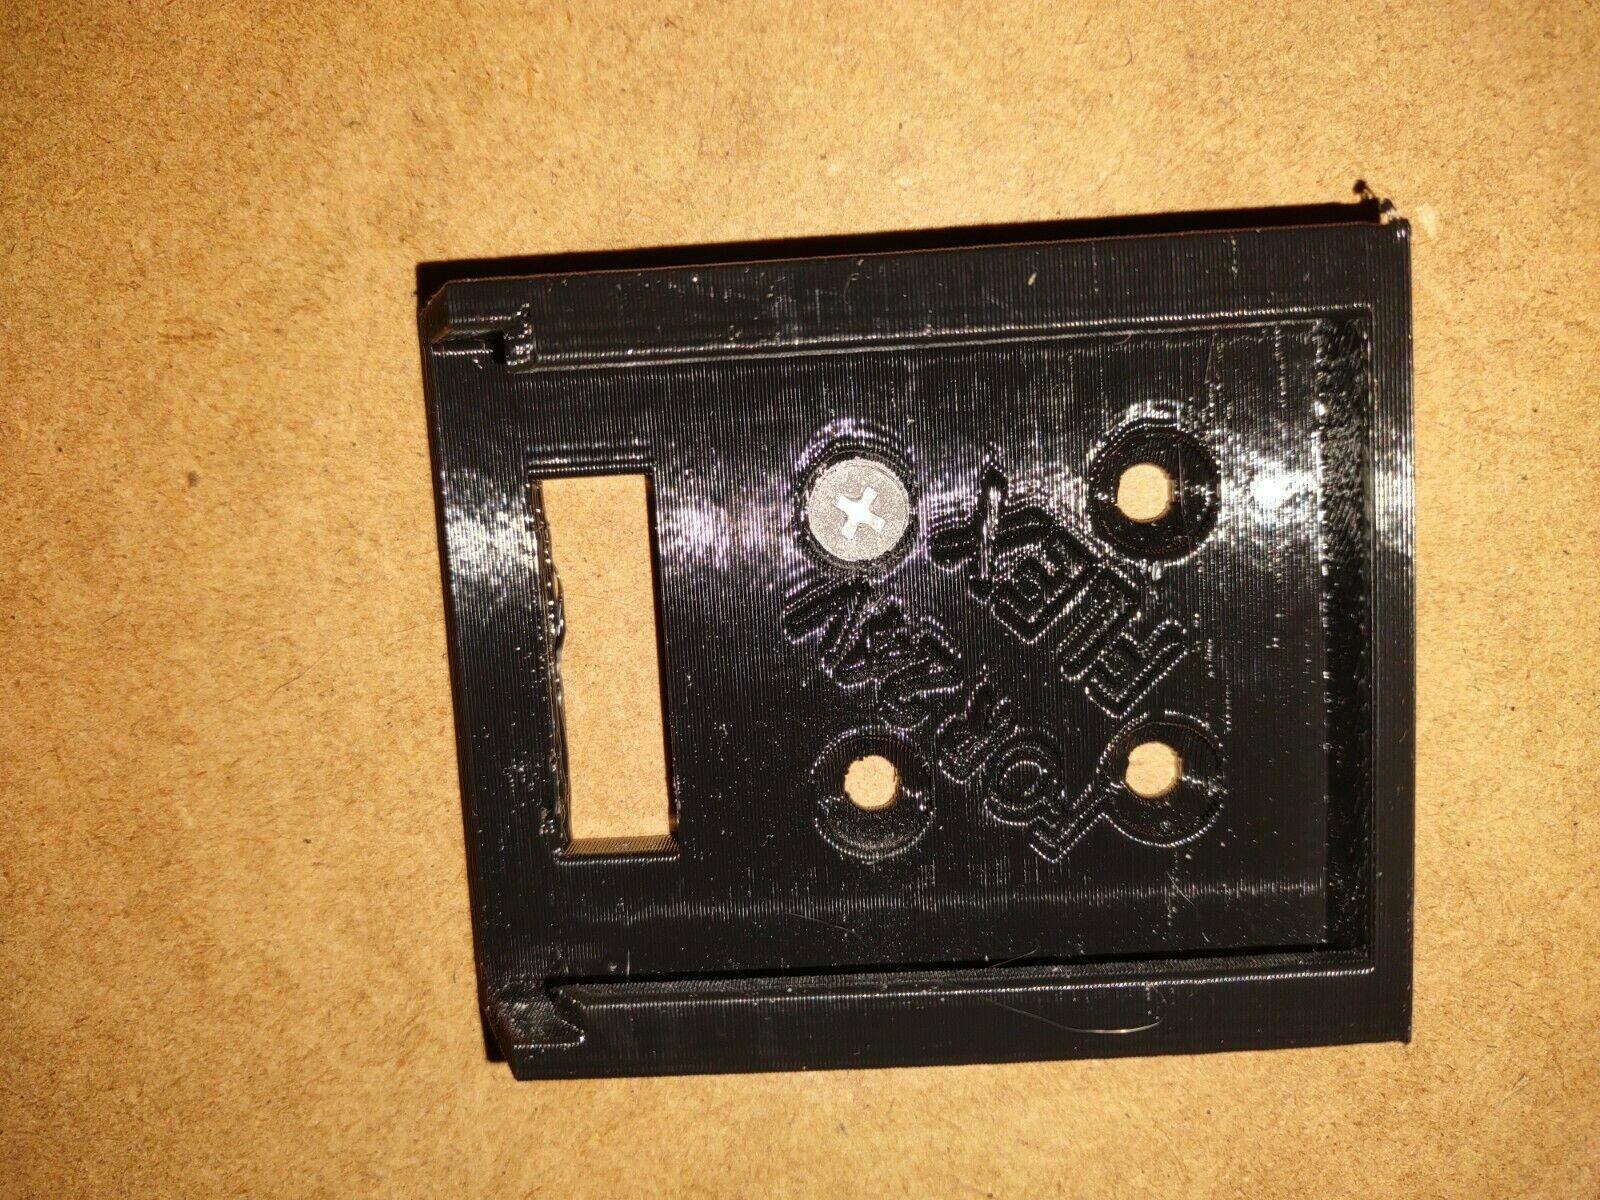 *4-Pack* Flex 24V Battery Holder - Protective Cover - Wall Mount